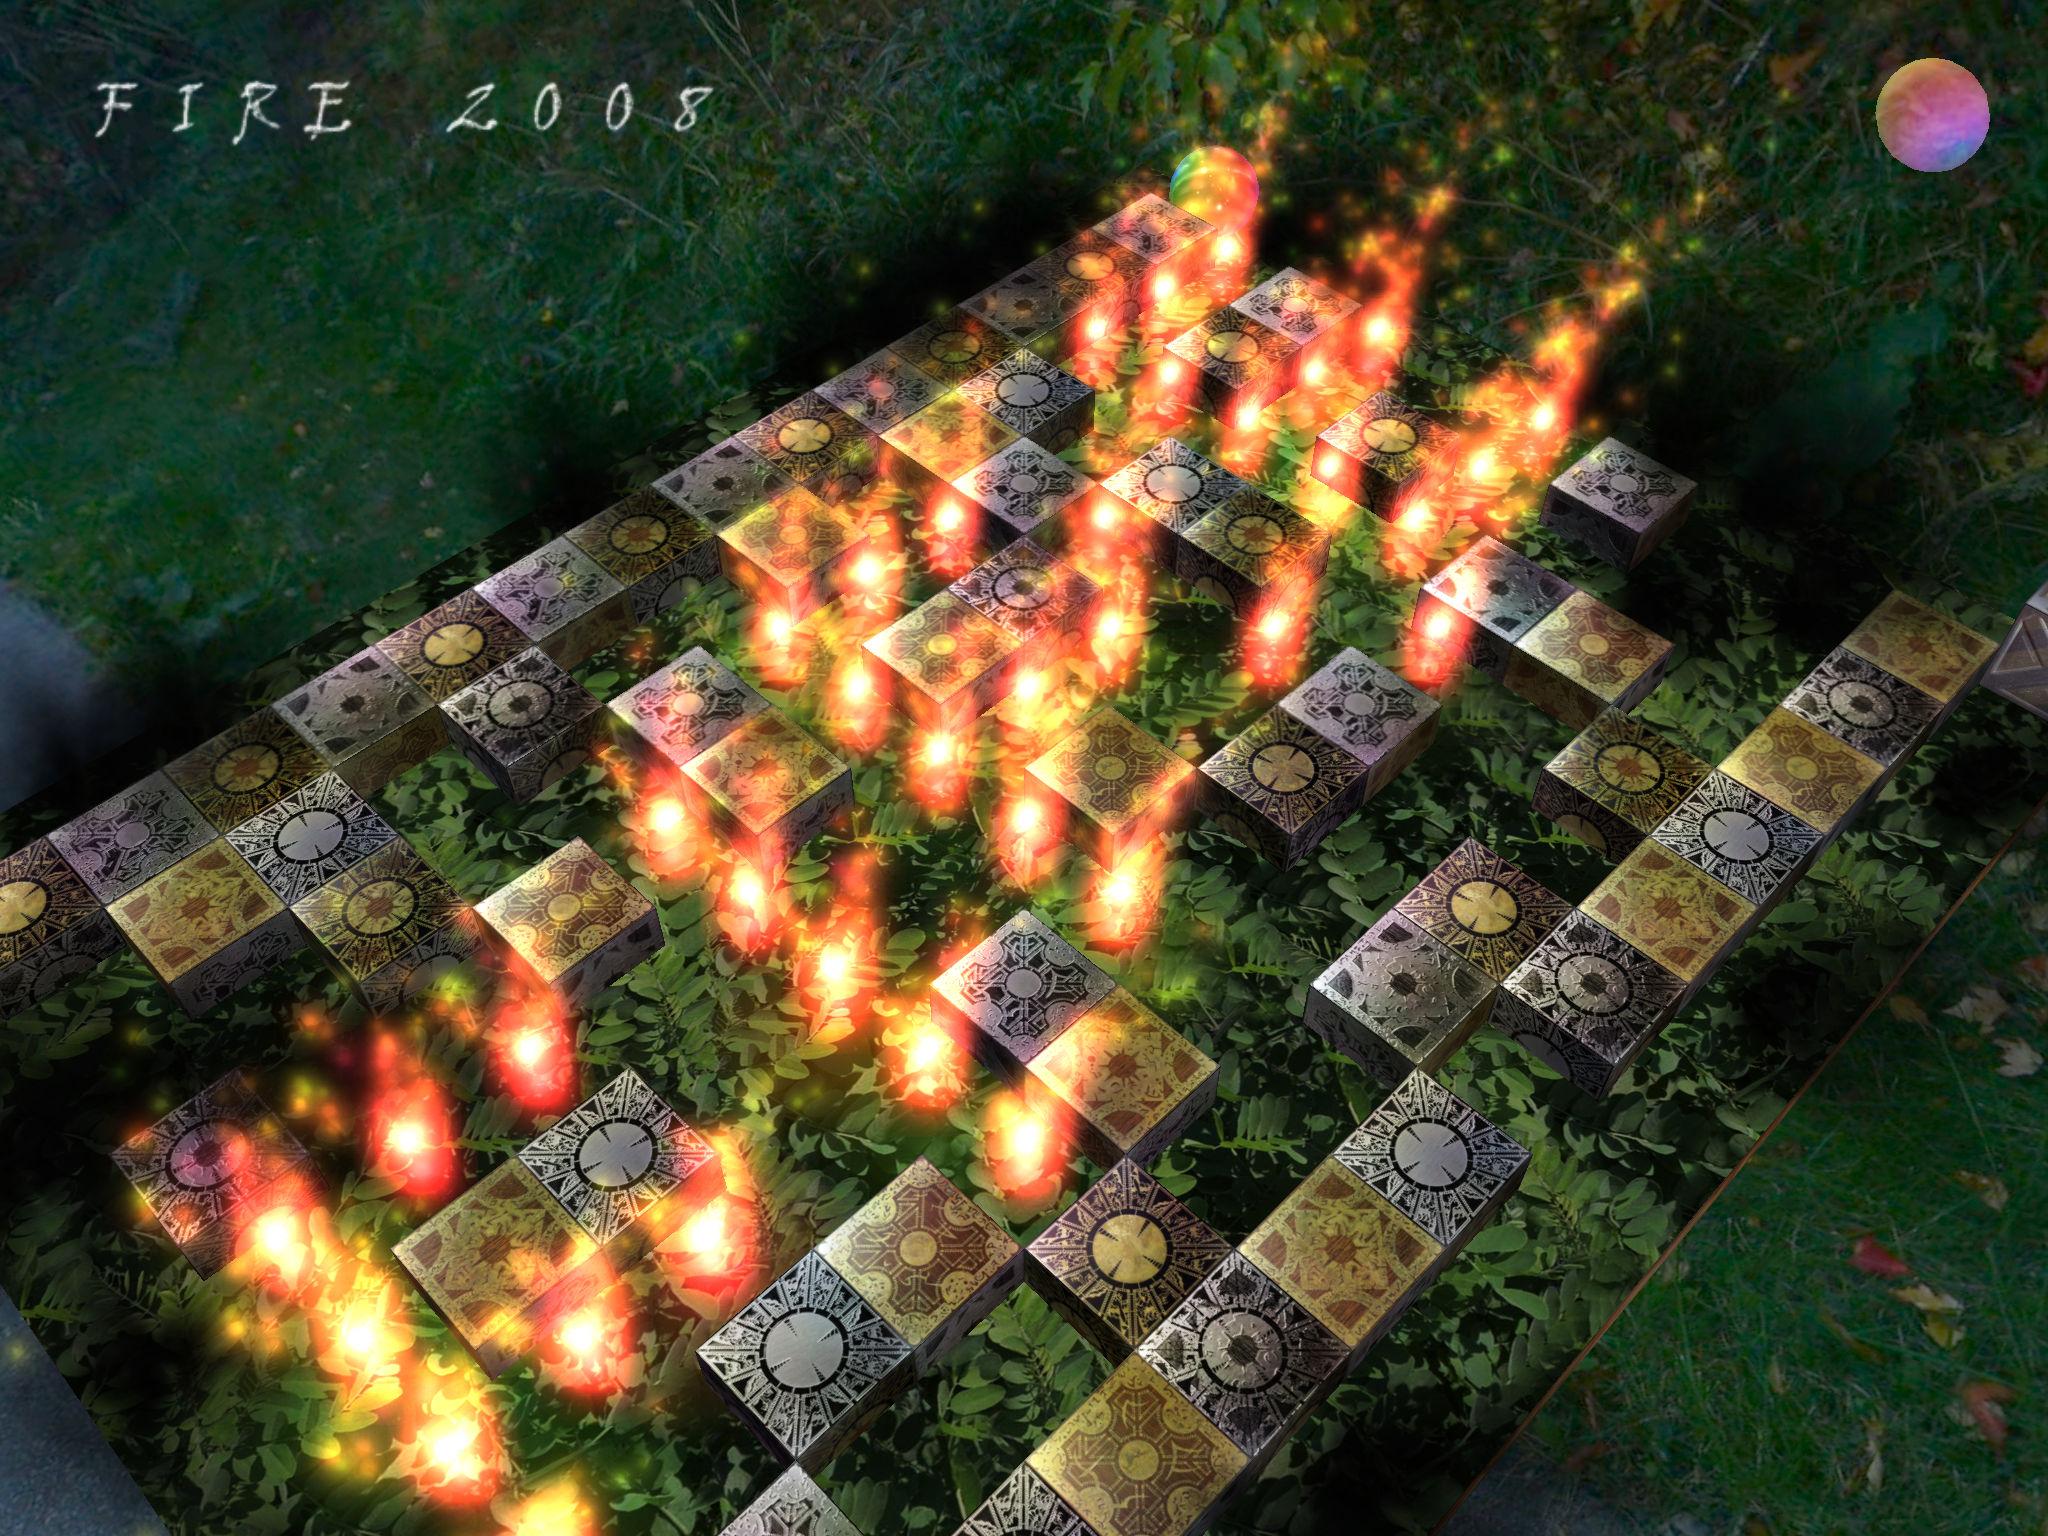 Fire12-N-cam1-crnr2ca-B.jpg